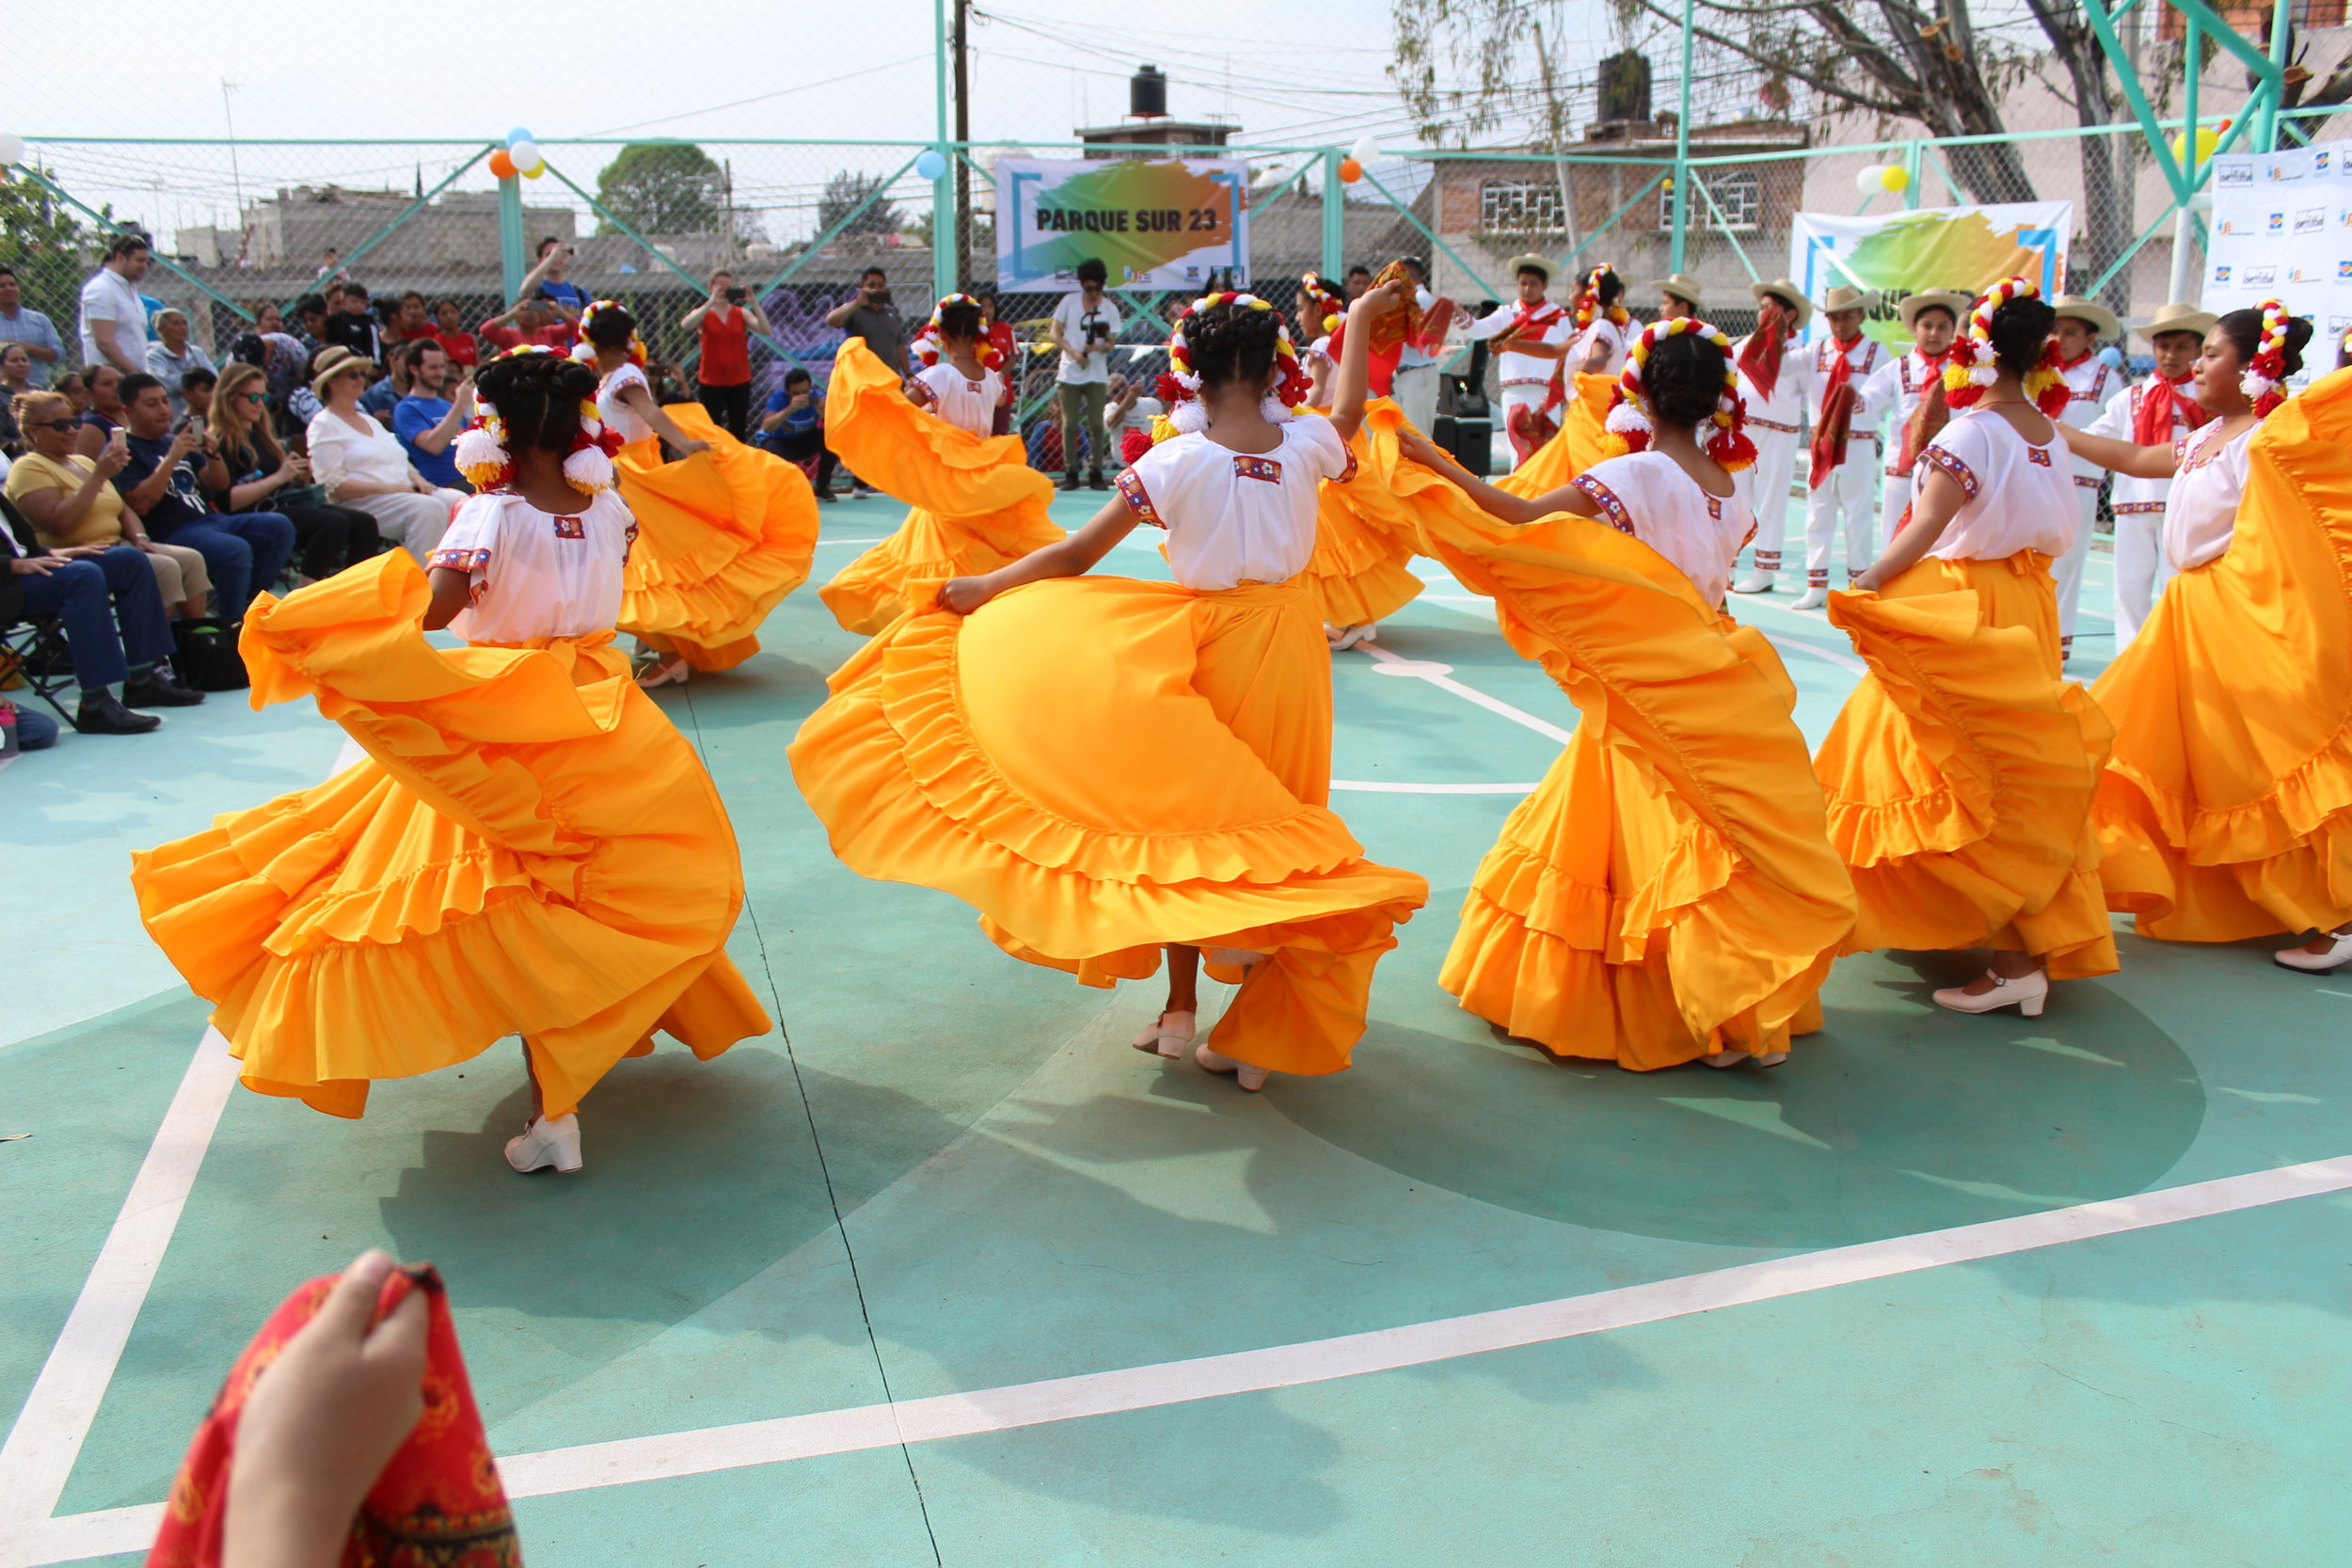 parque-sur-23-xico-mexico-lovefutbol-pincus-family-foundation-2